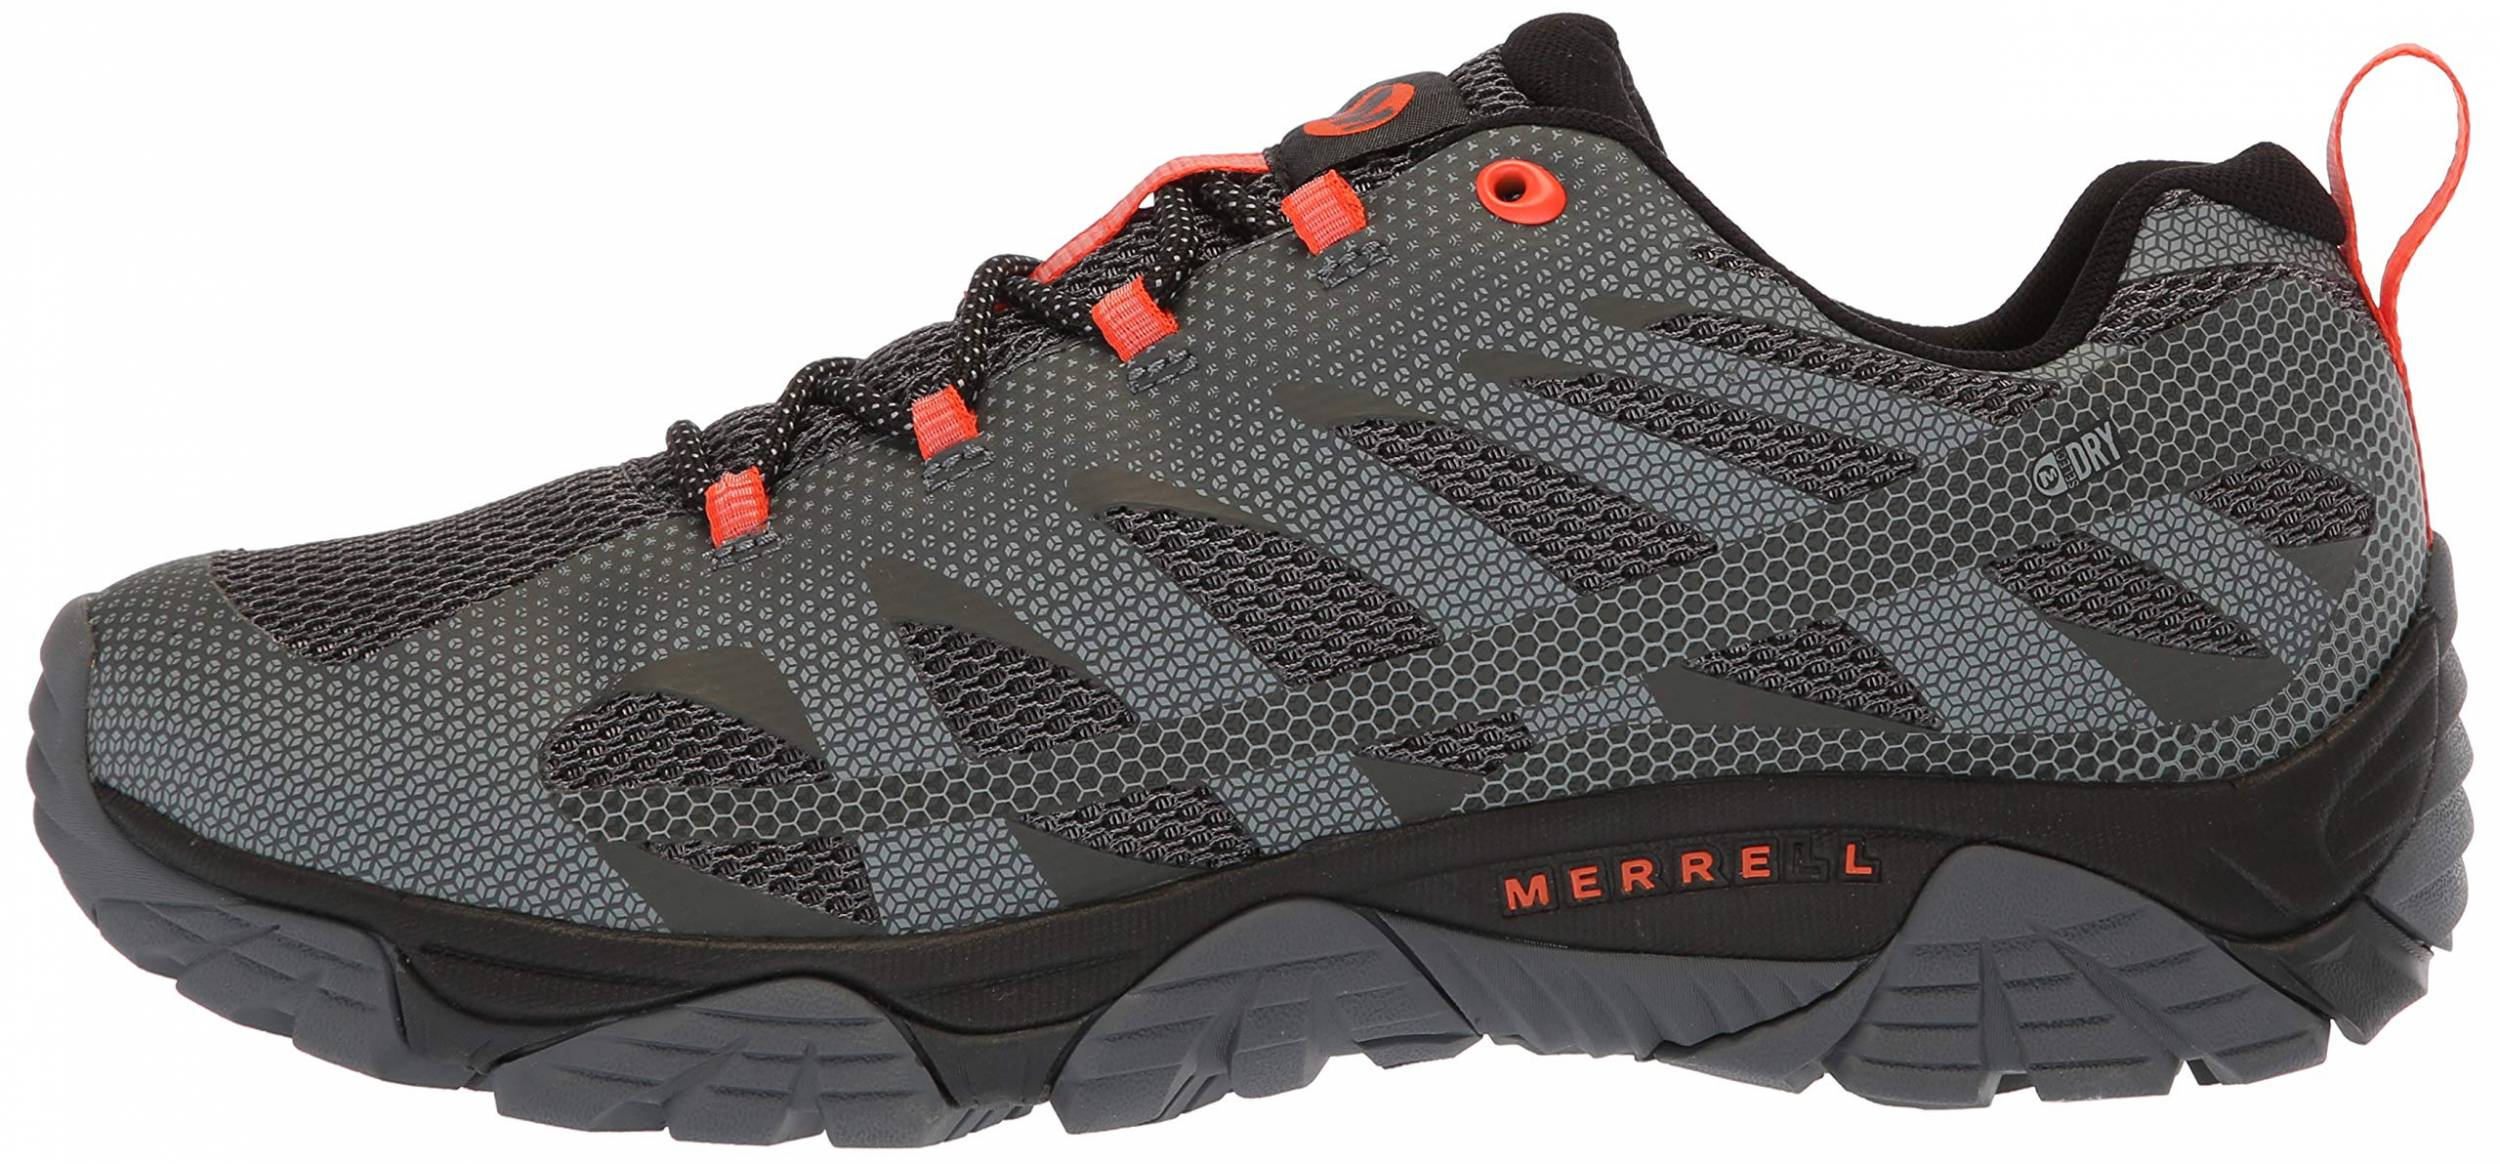 merrell moab 2 waterproof